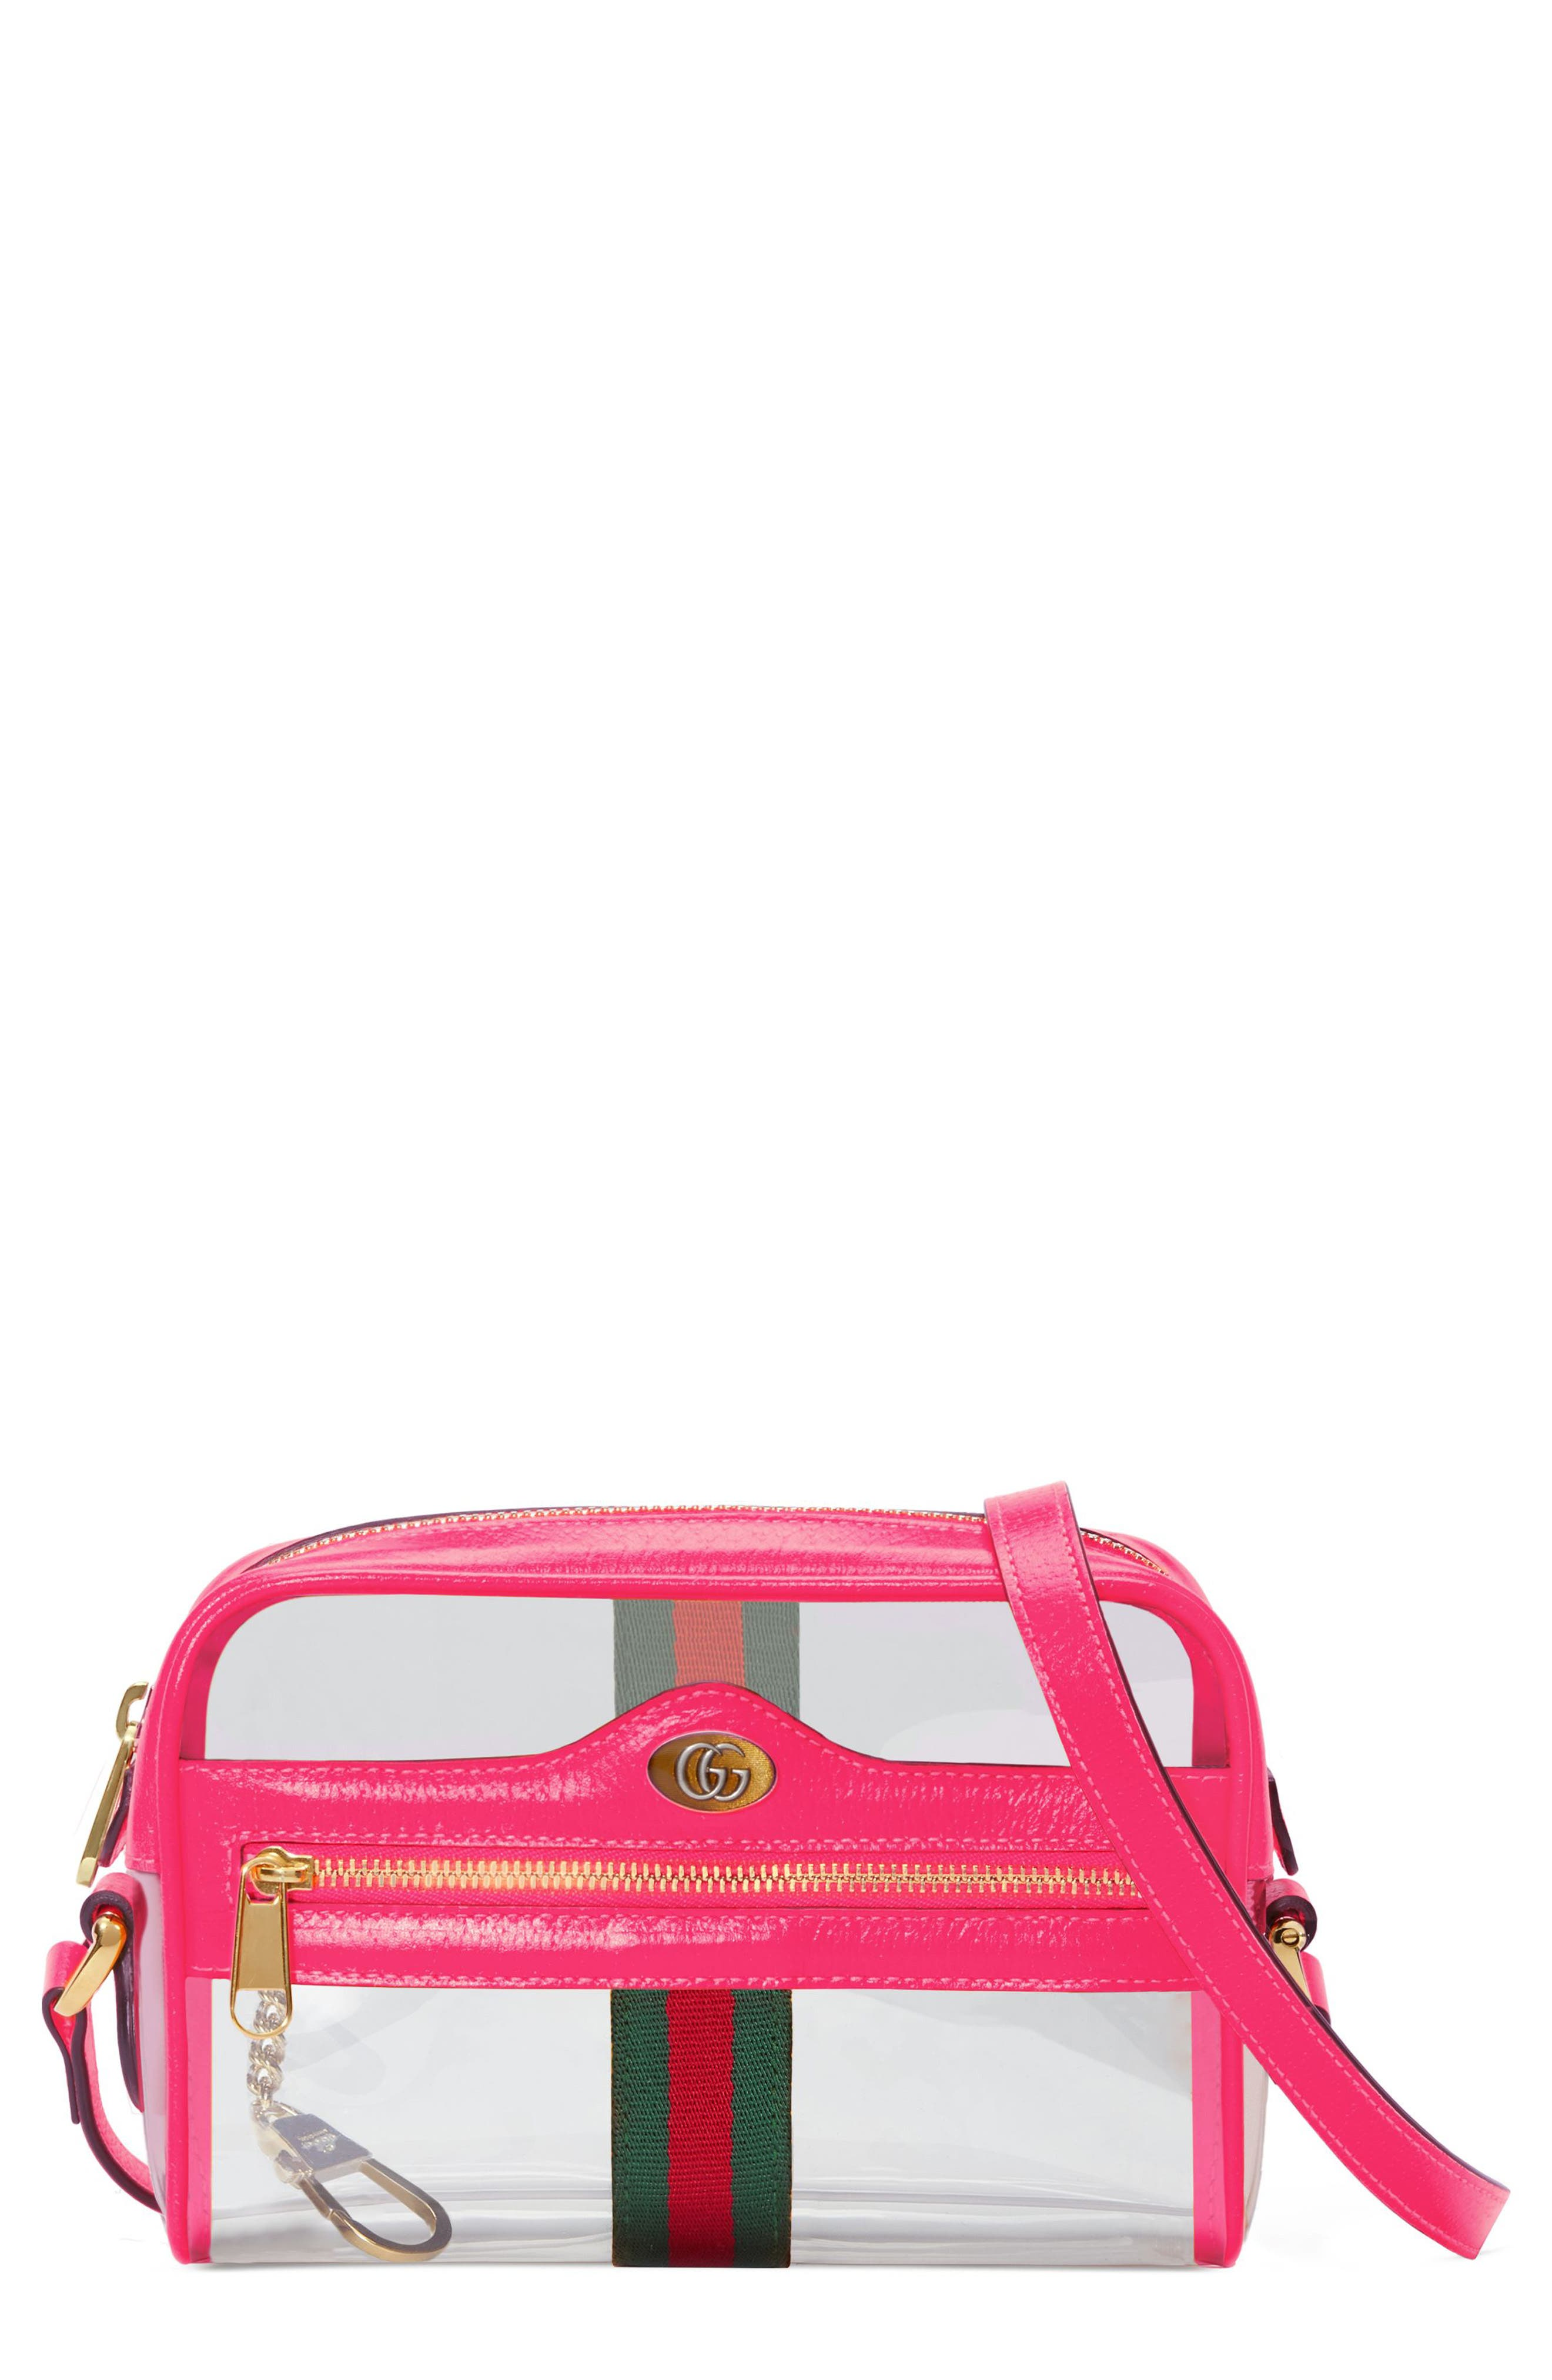 Mini Ophidia Transparent Convertible Bag,                             Main thumbnail 1, color,                             650